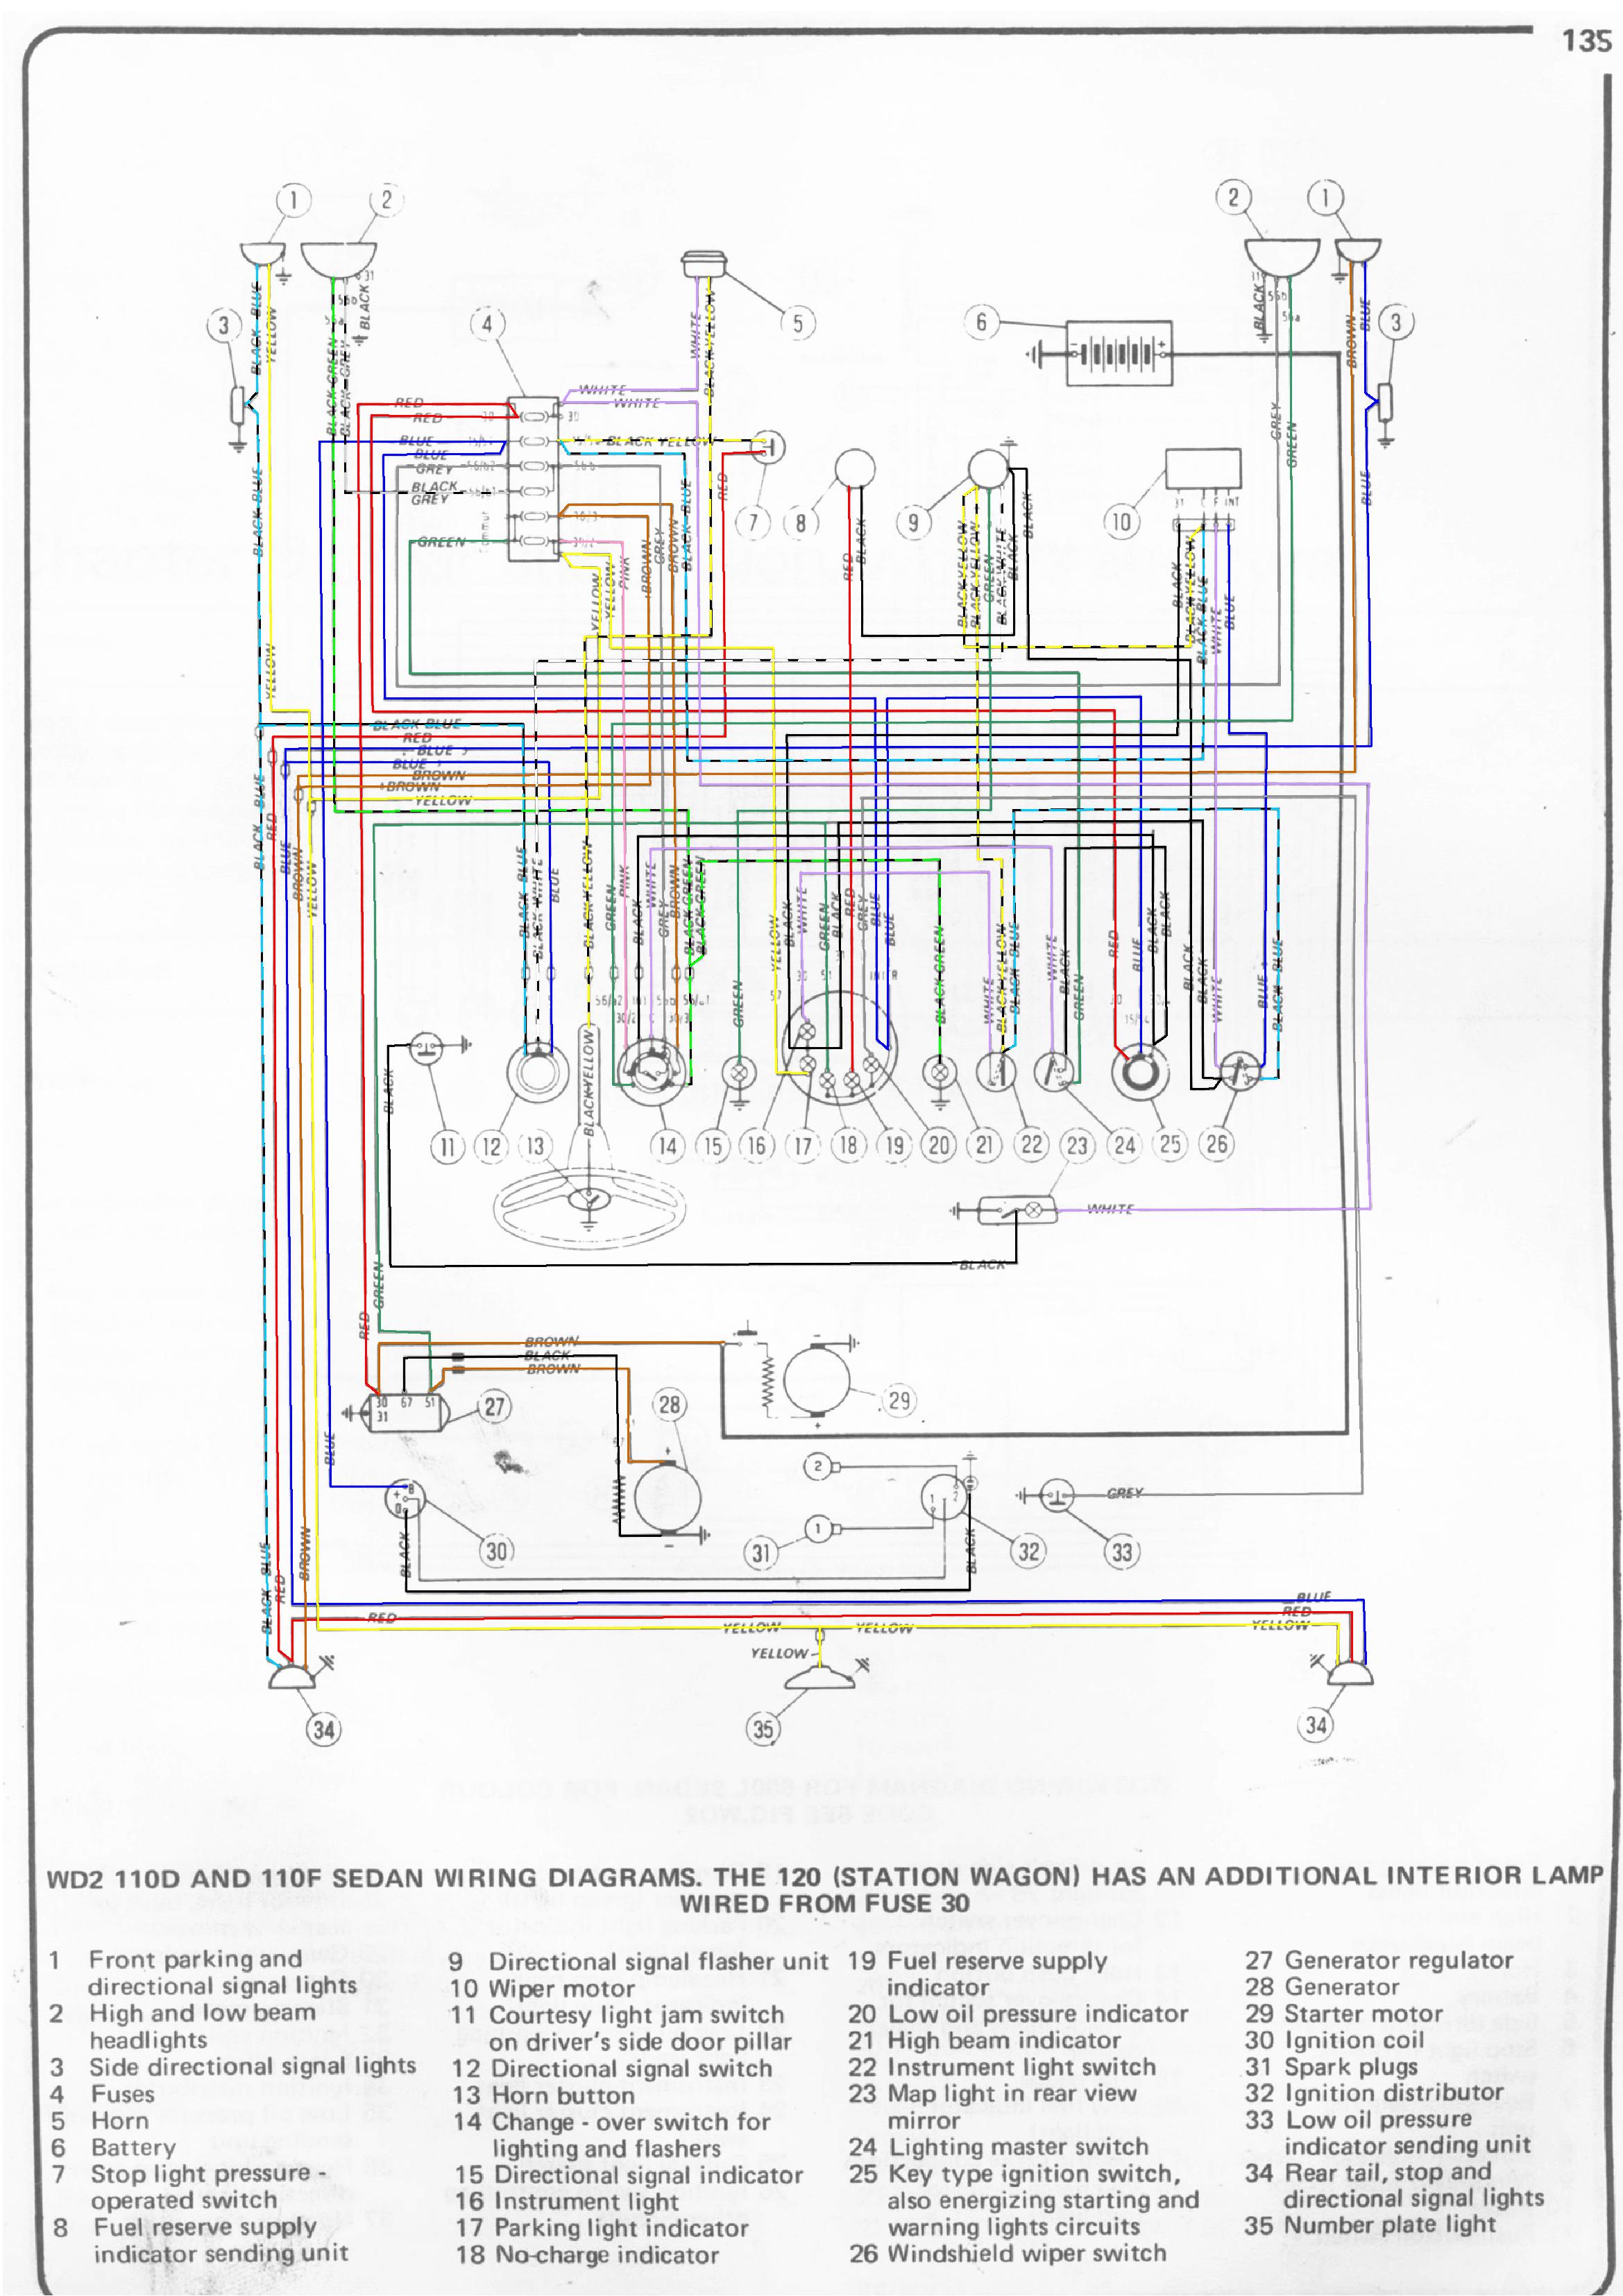 small resolution of fiat 640 wiring diagram wiring diagramfiat 600 tractor wiring diagram wiring diagram blogfiat 600 wiring diagram